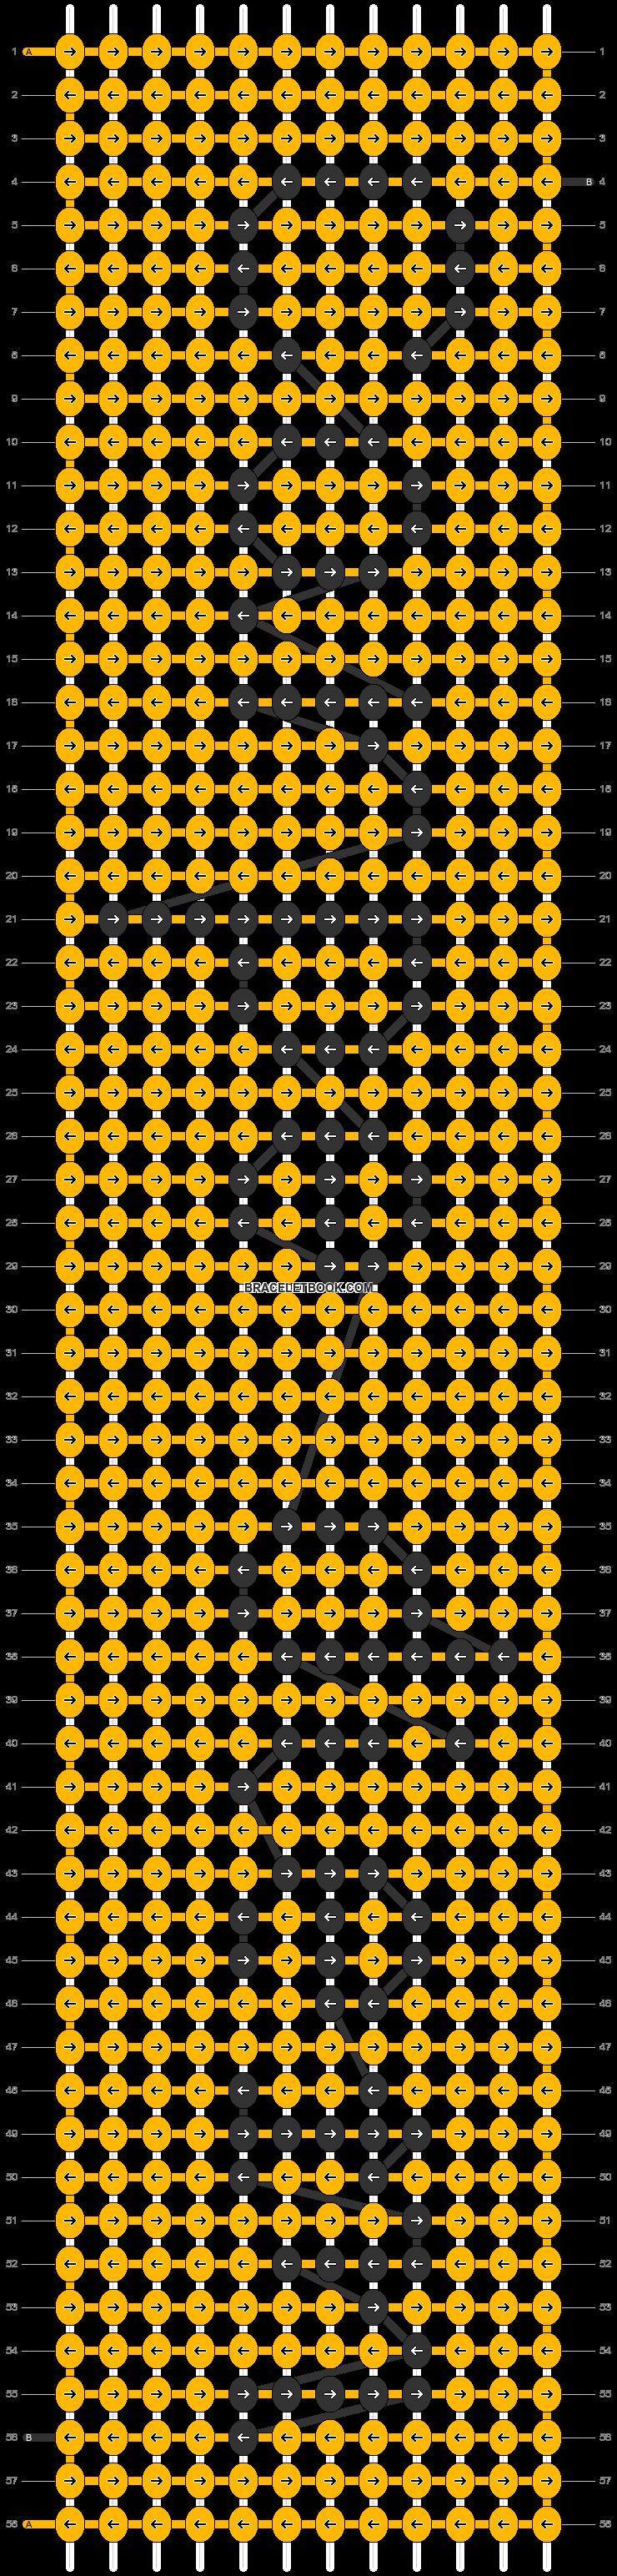 Alpha pattern #20940 variation #15305 pattern